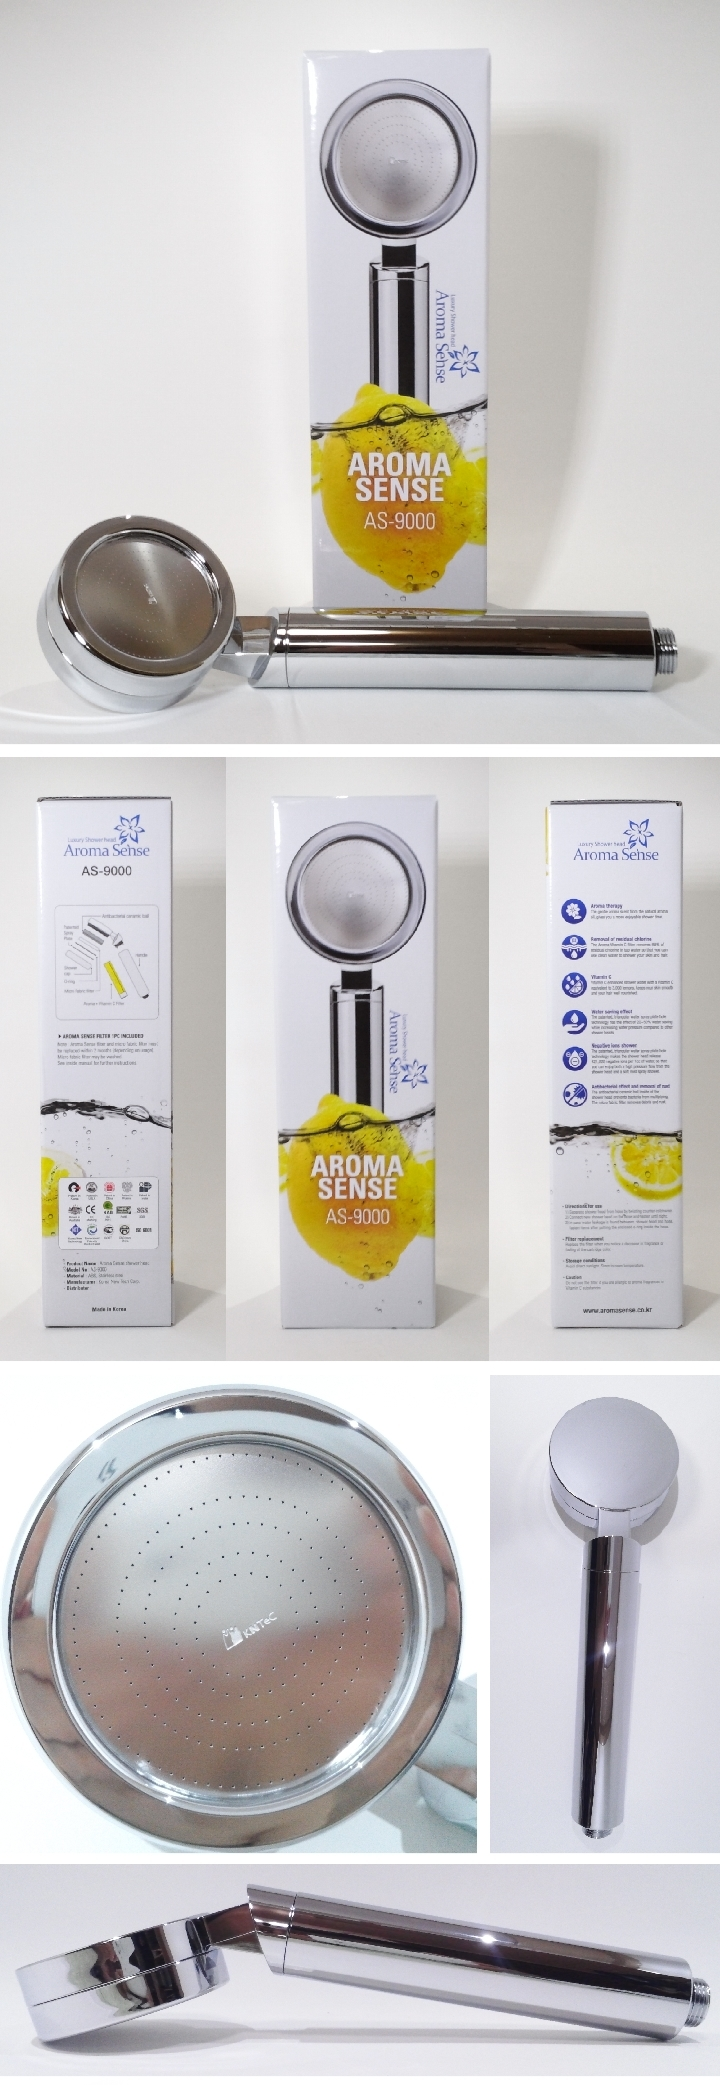 kntec aroma sense vitamin c water saving super jet as 9000 chrome shower head ebay. Black Bedroom Furniture Sets. Home Design Ideas